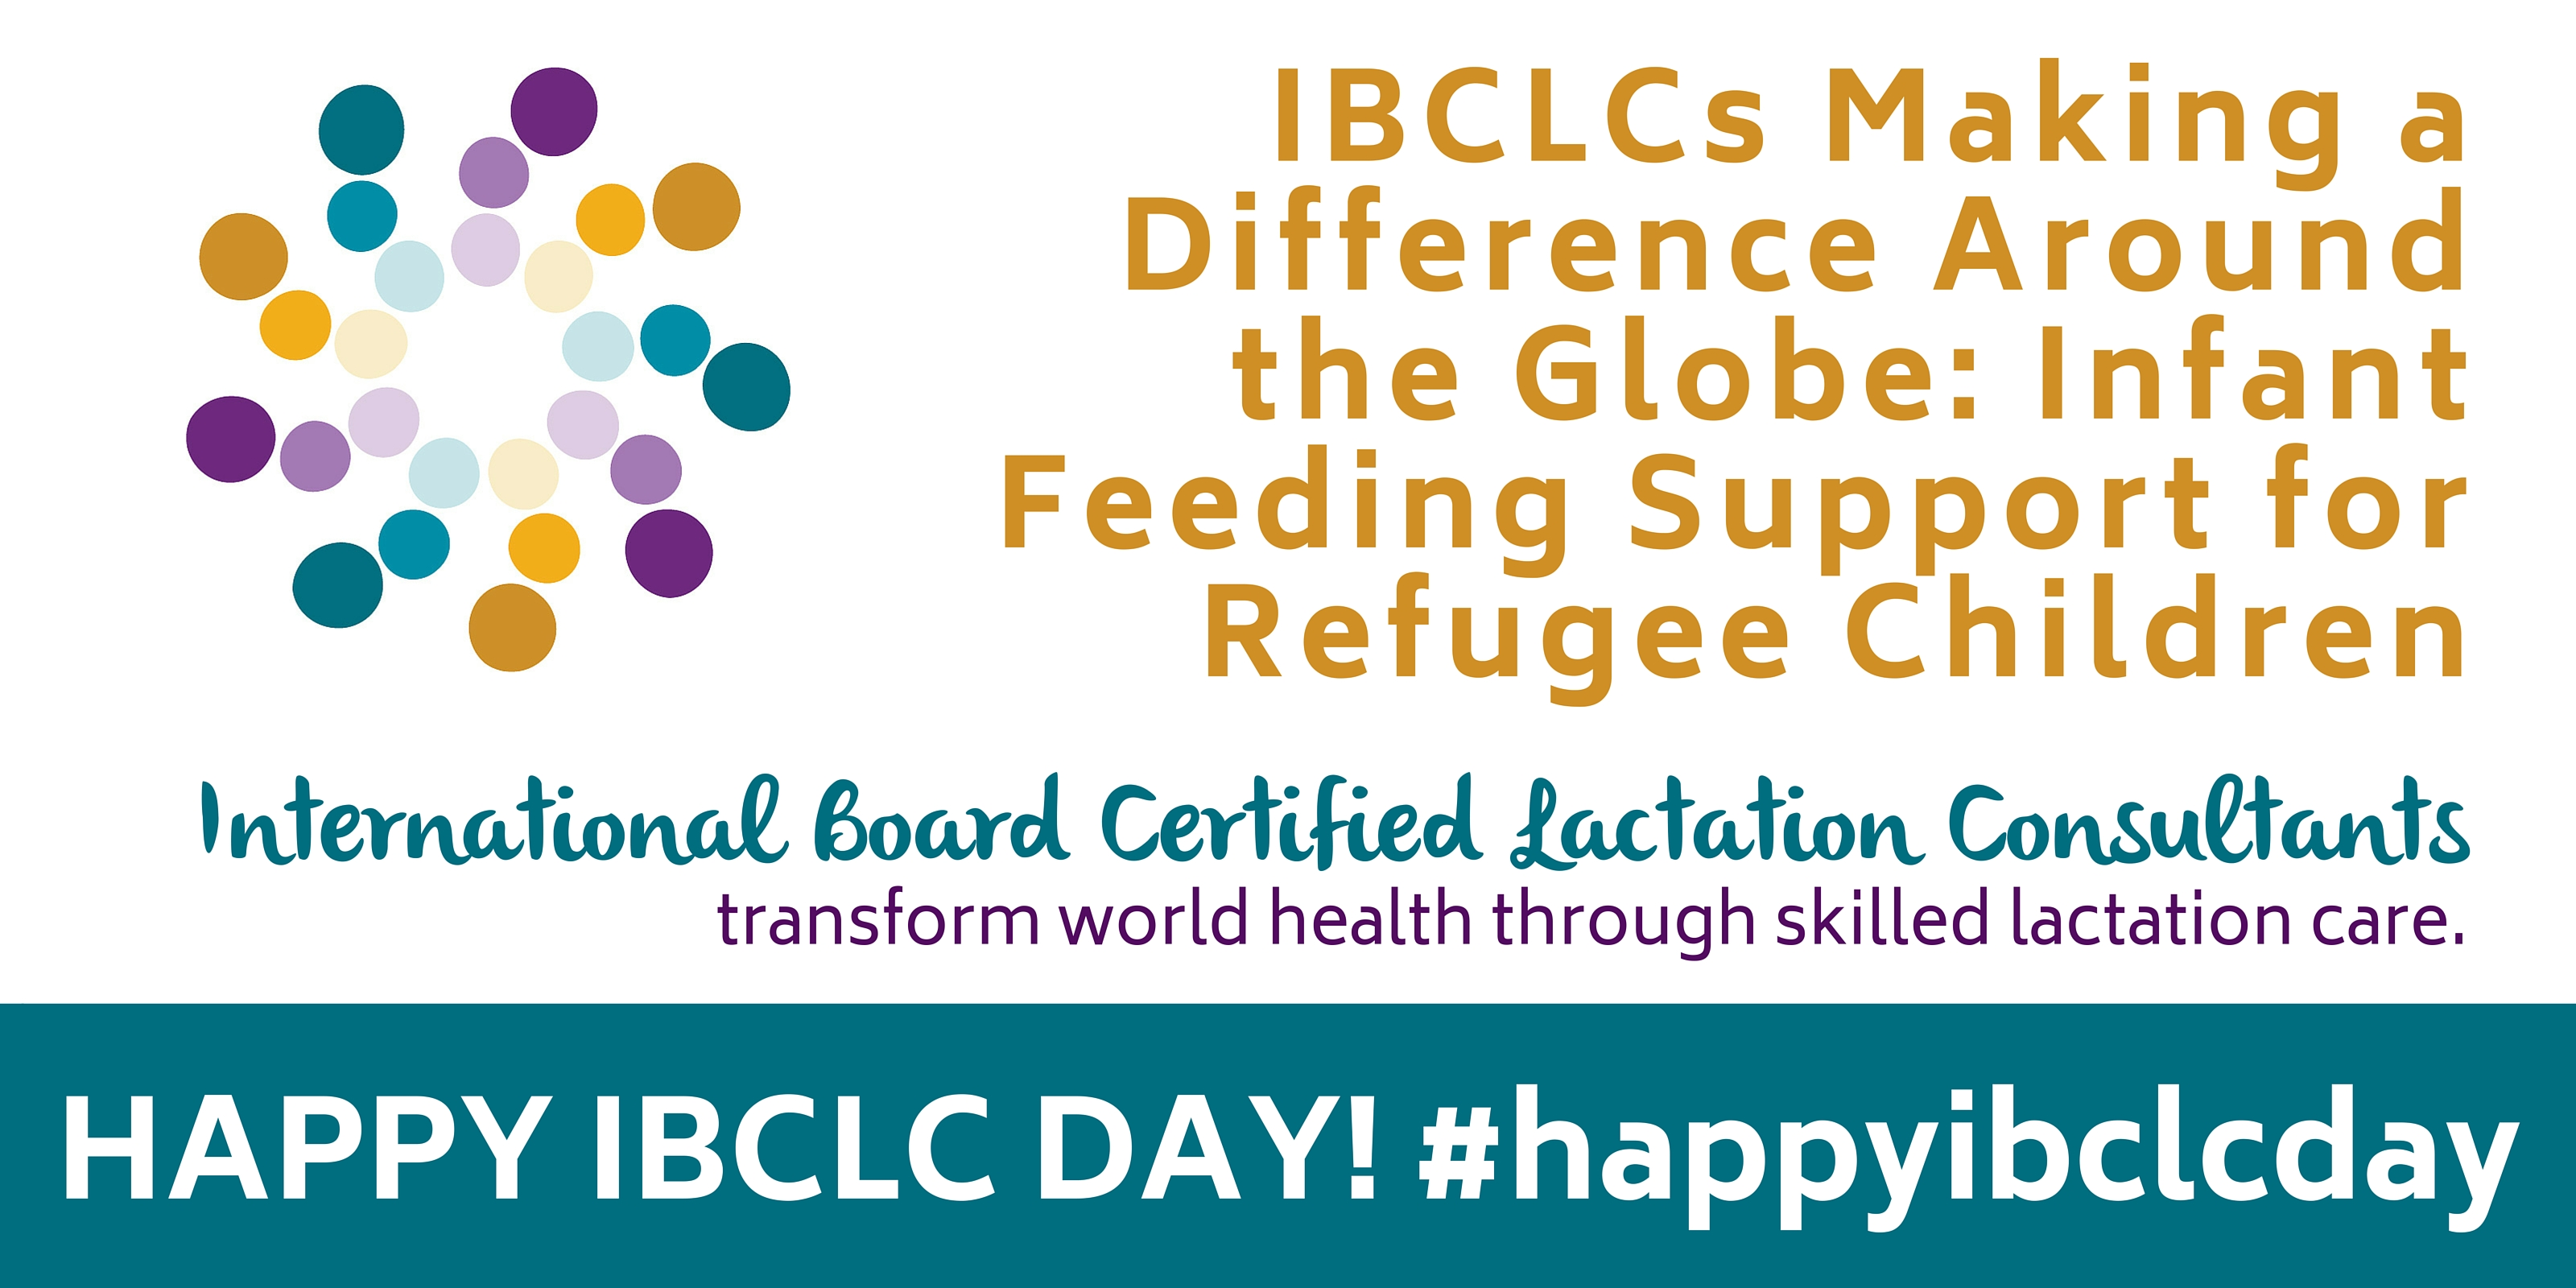 HAPPY IBCLC DAY! Jodine